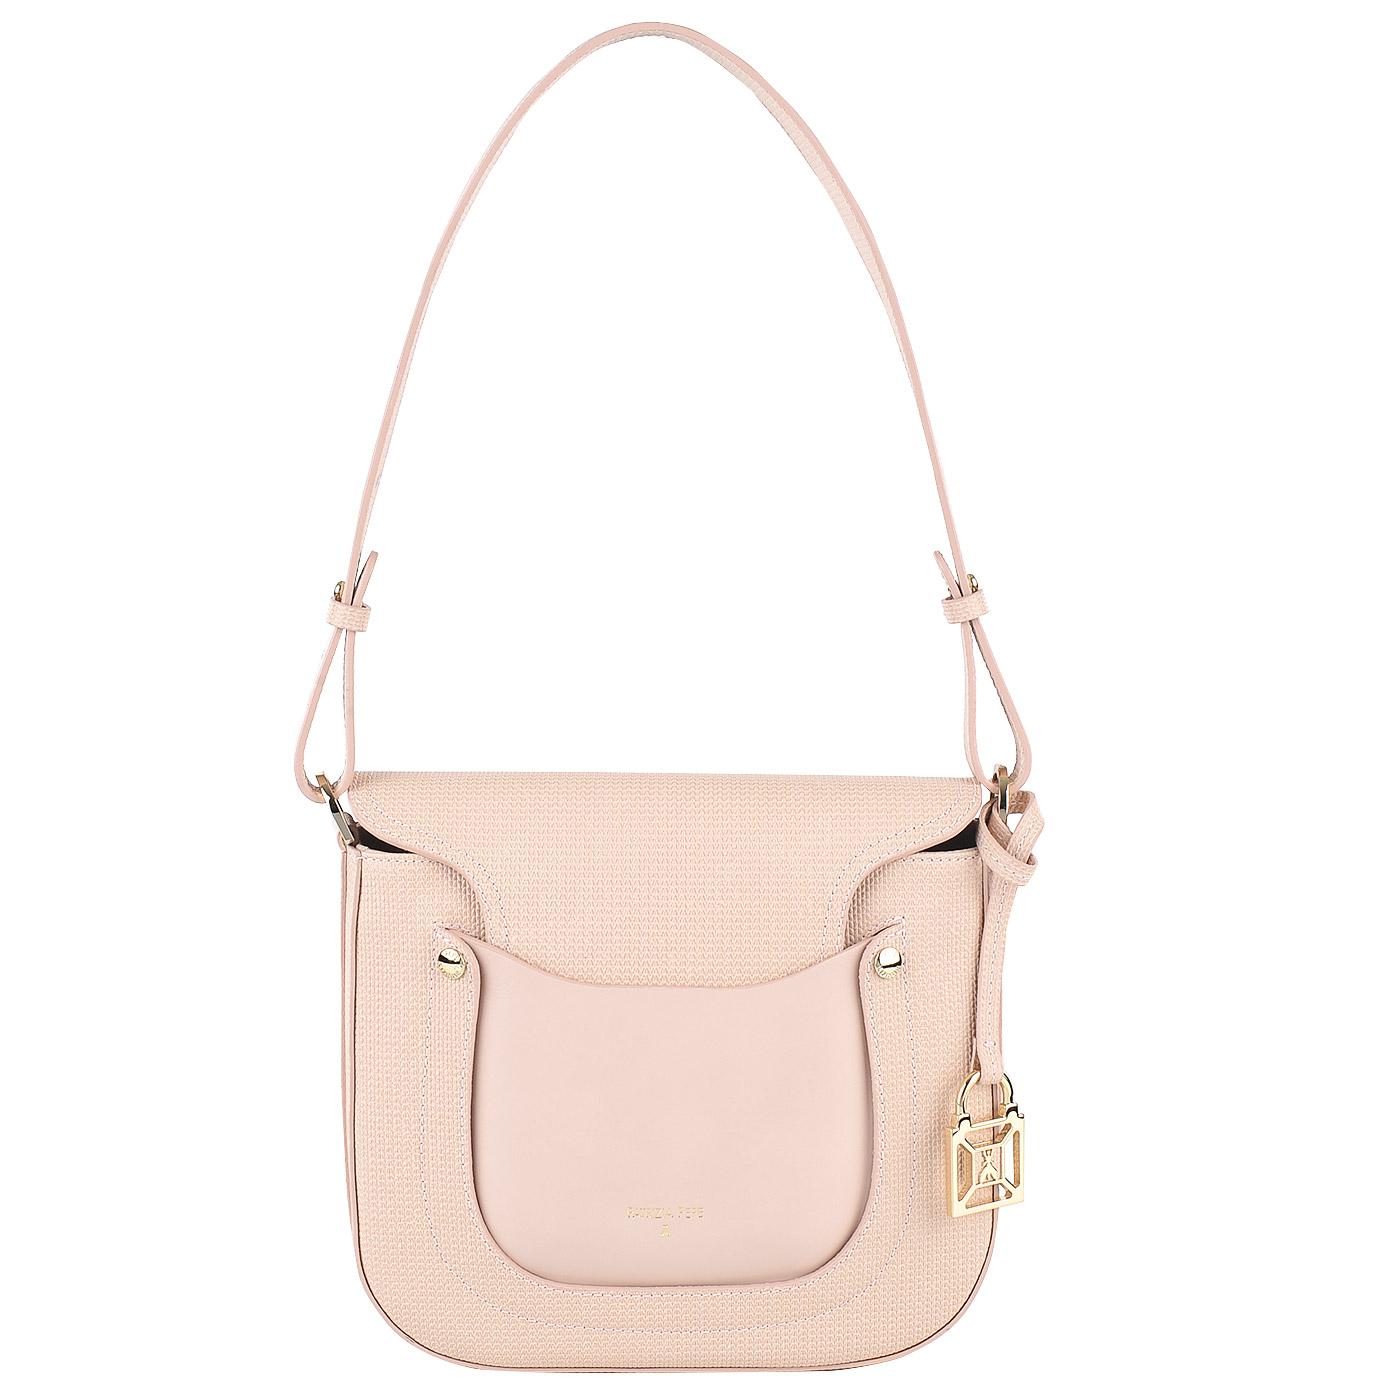 6364b0315bf7 Женская кожаная сумка через плечо Patrizia Pepe Game Pocket 2V6900 ...